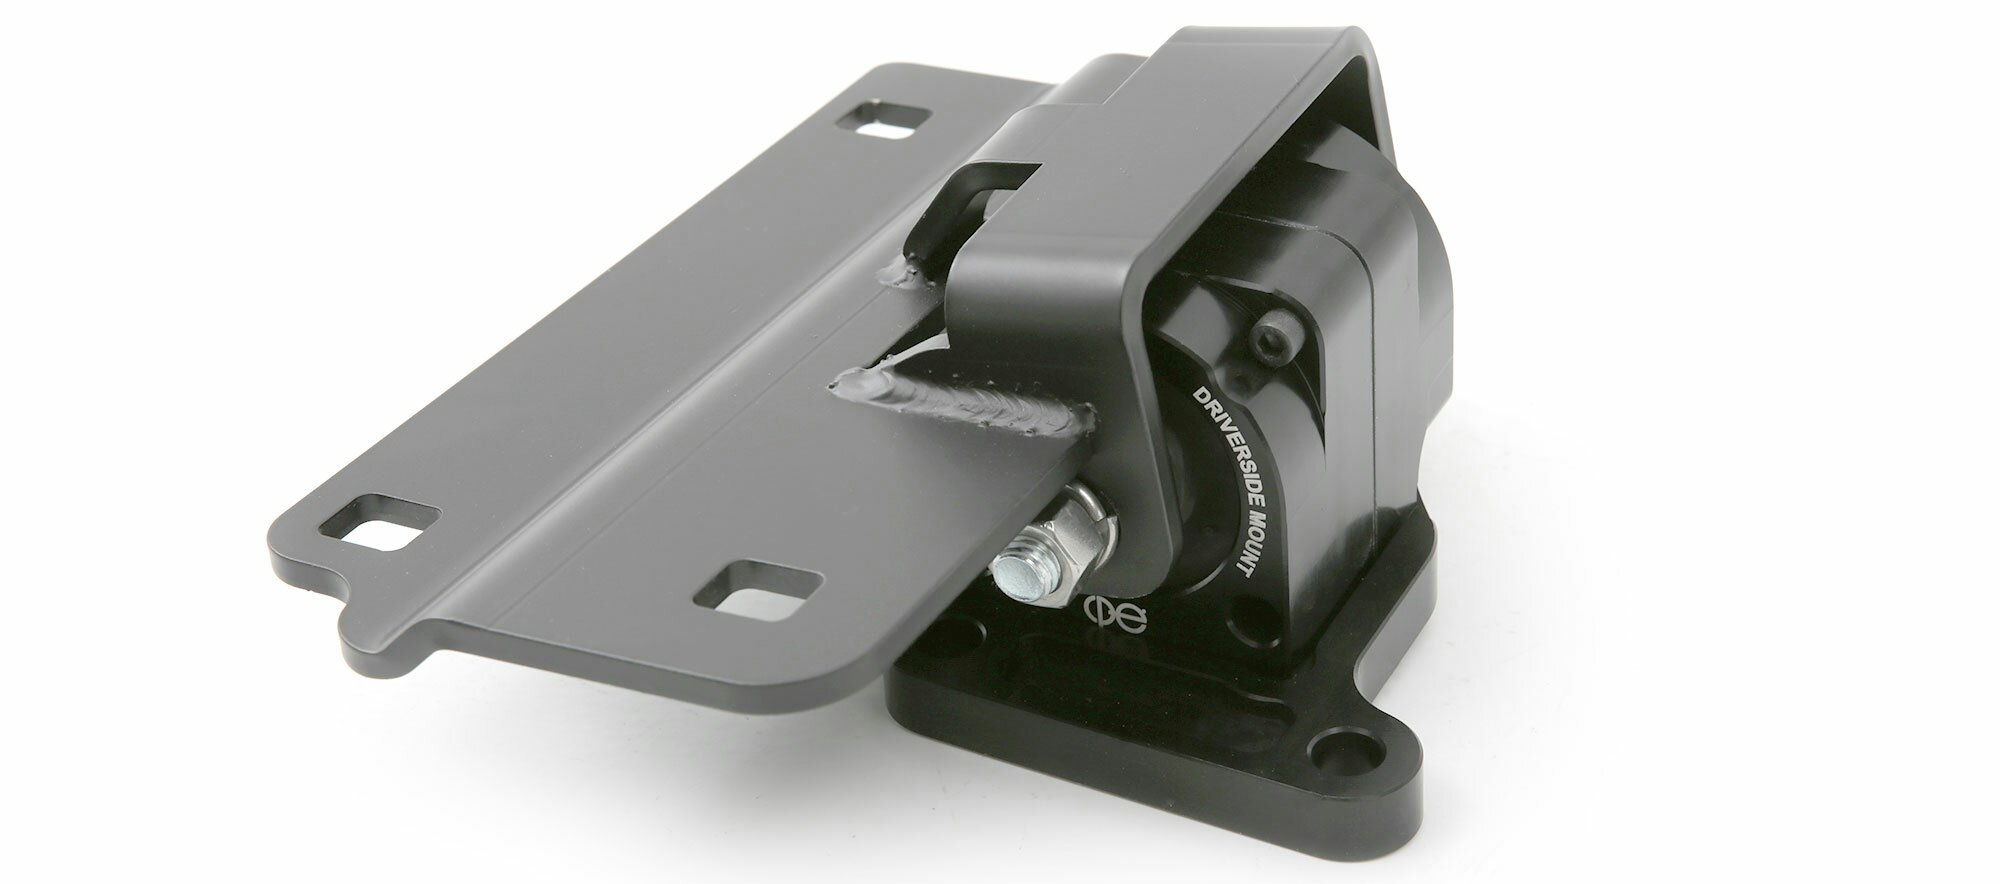 Sold brand new focus st cp e motor mounts for Focus st rear motor mount